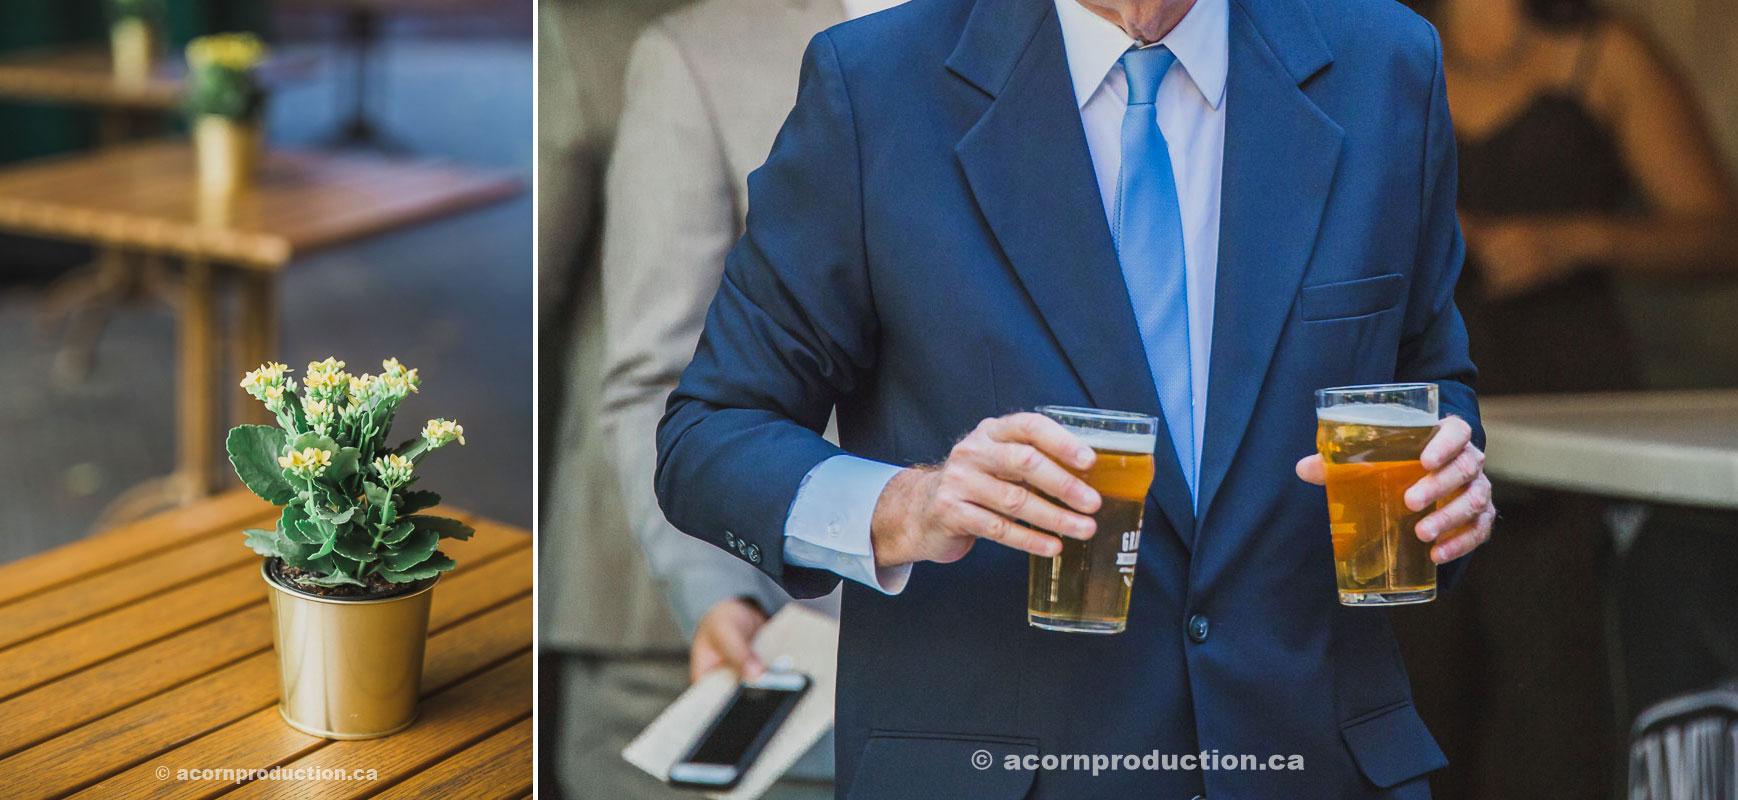 toronto-granite-brewery-wedding-photography-by-acornproduction.ca-09.jpg